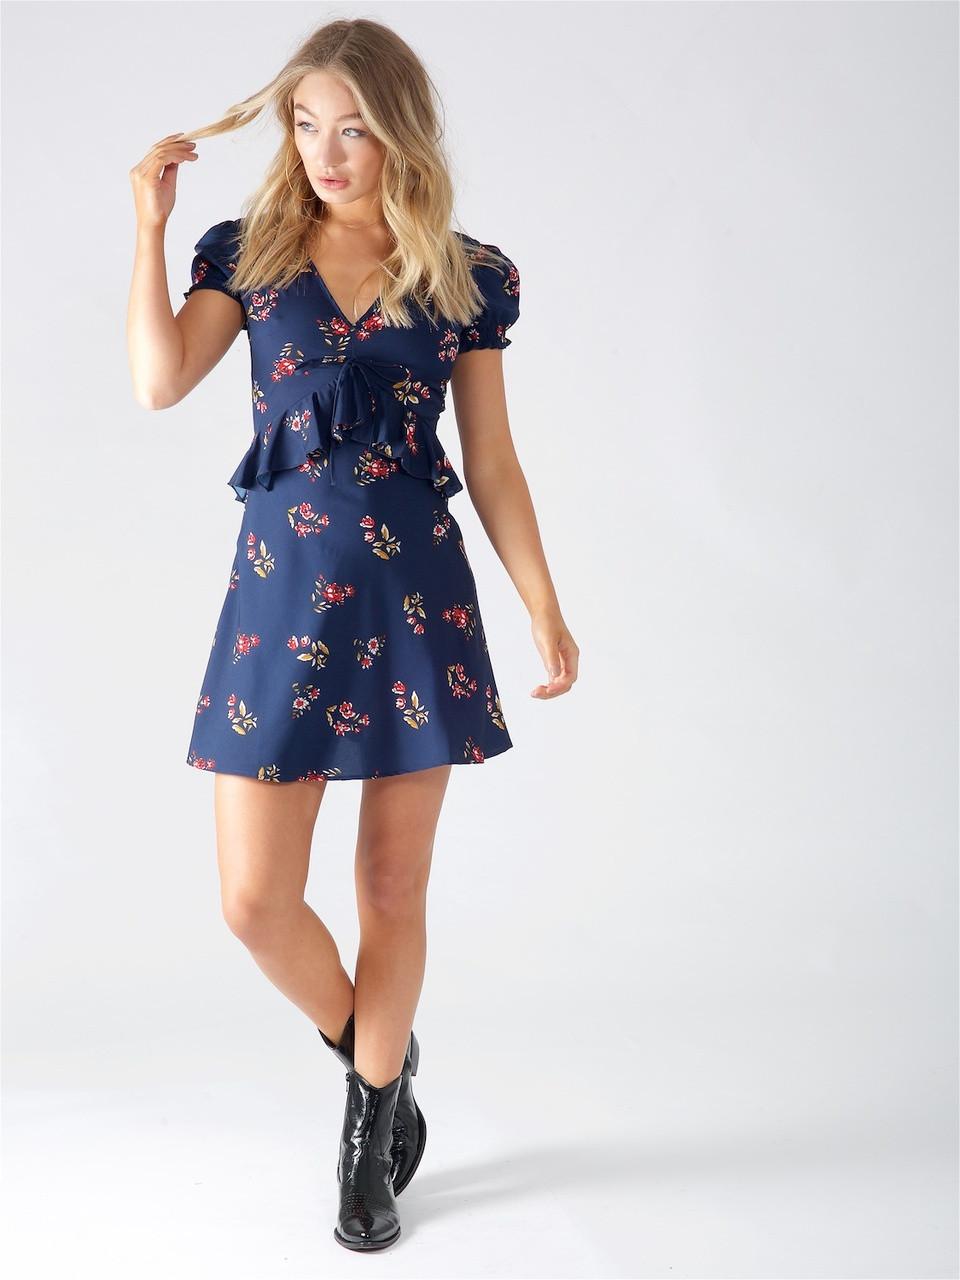 Navy Floral Peplum Mini Dress